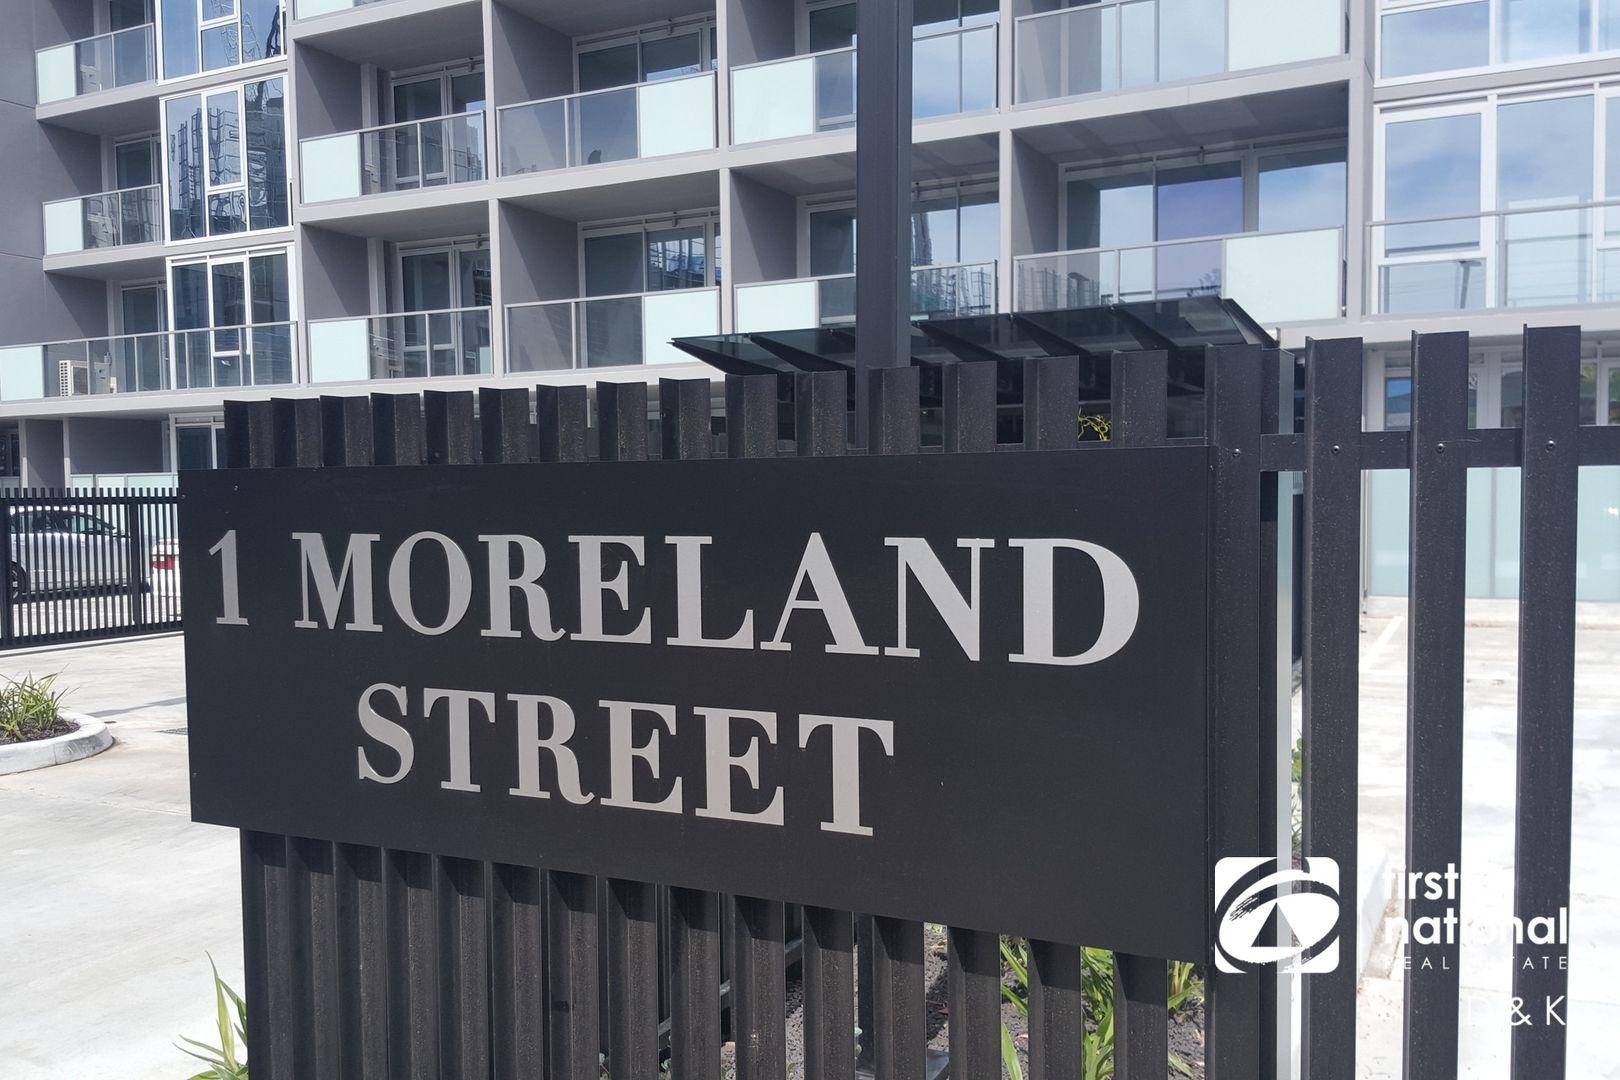 409/1 Moreland Street, Footscray VIC 3011, Image 0